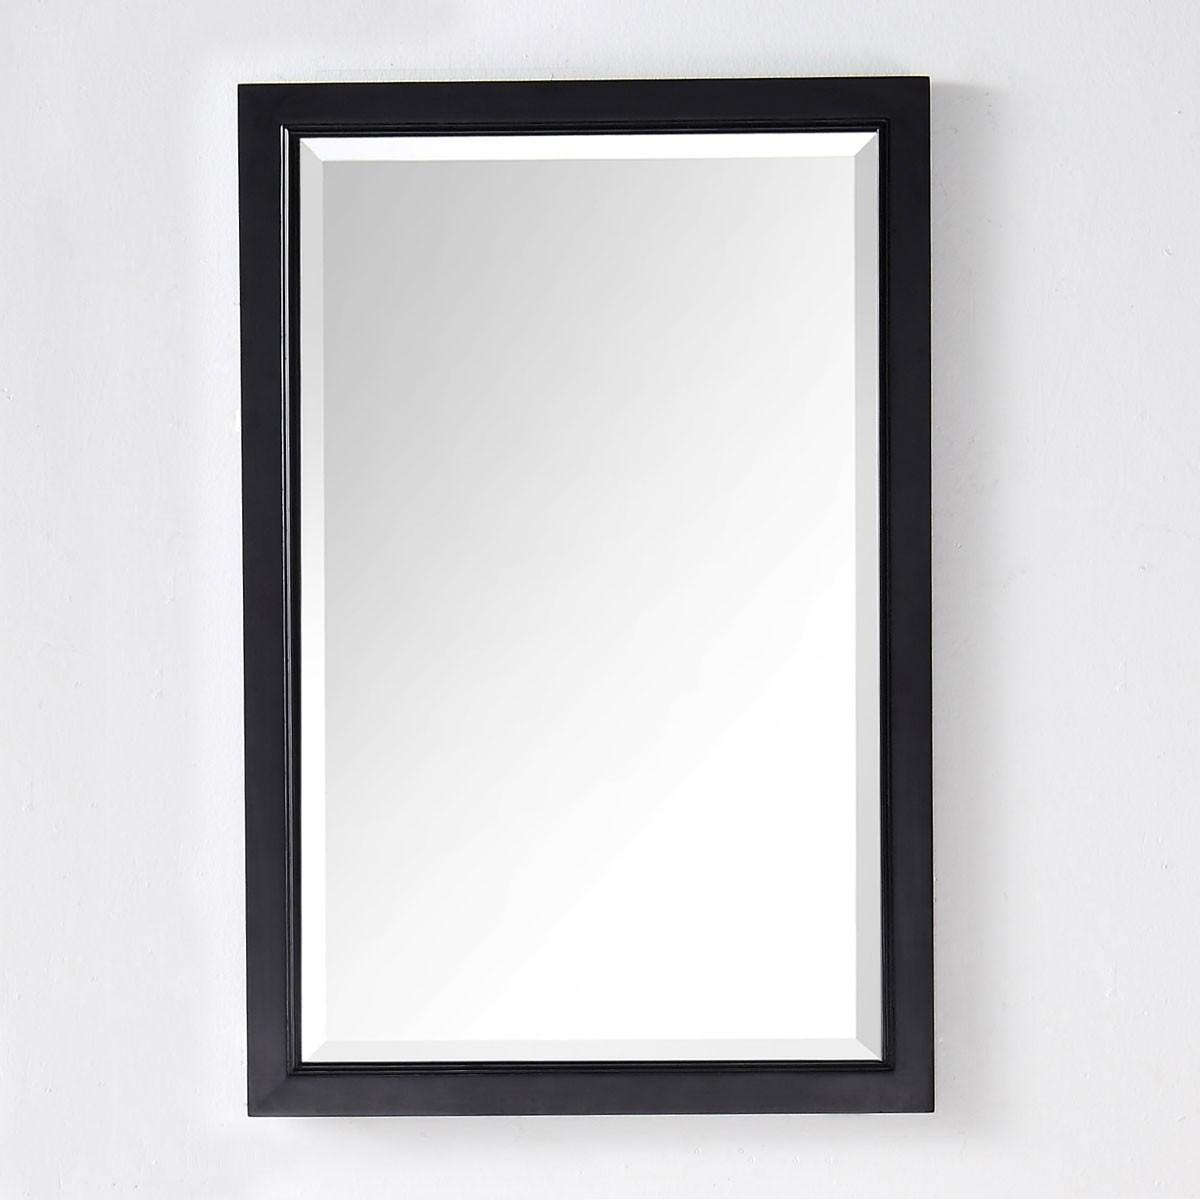 24 x 36 In Mirror with Espresso Frame (DK-6000-EM)